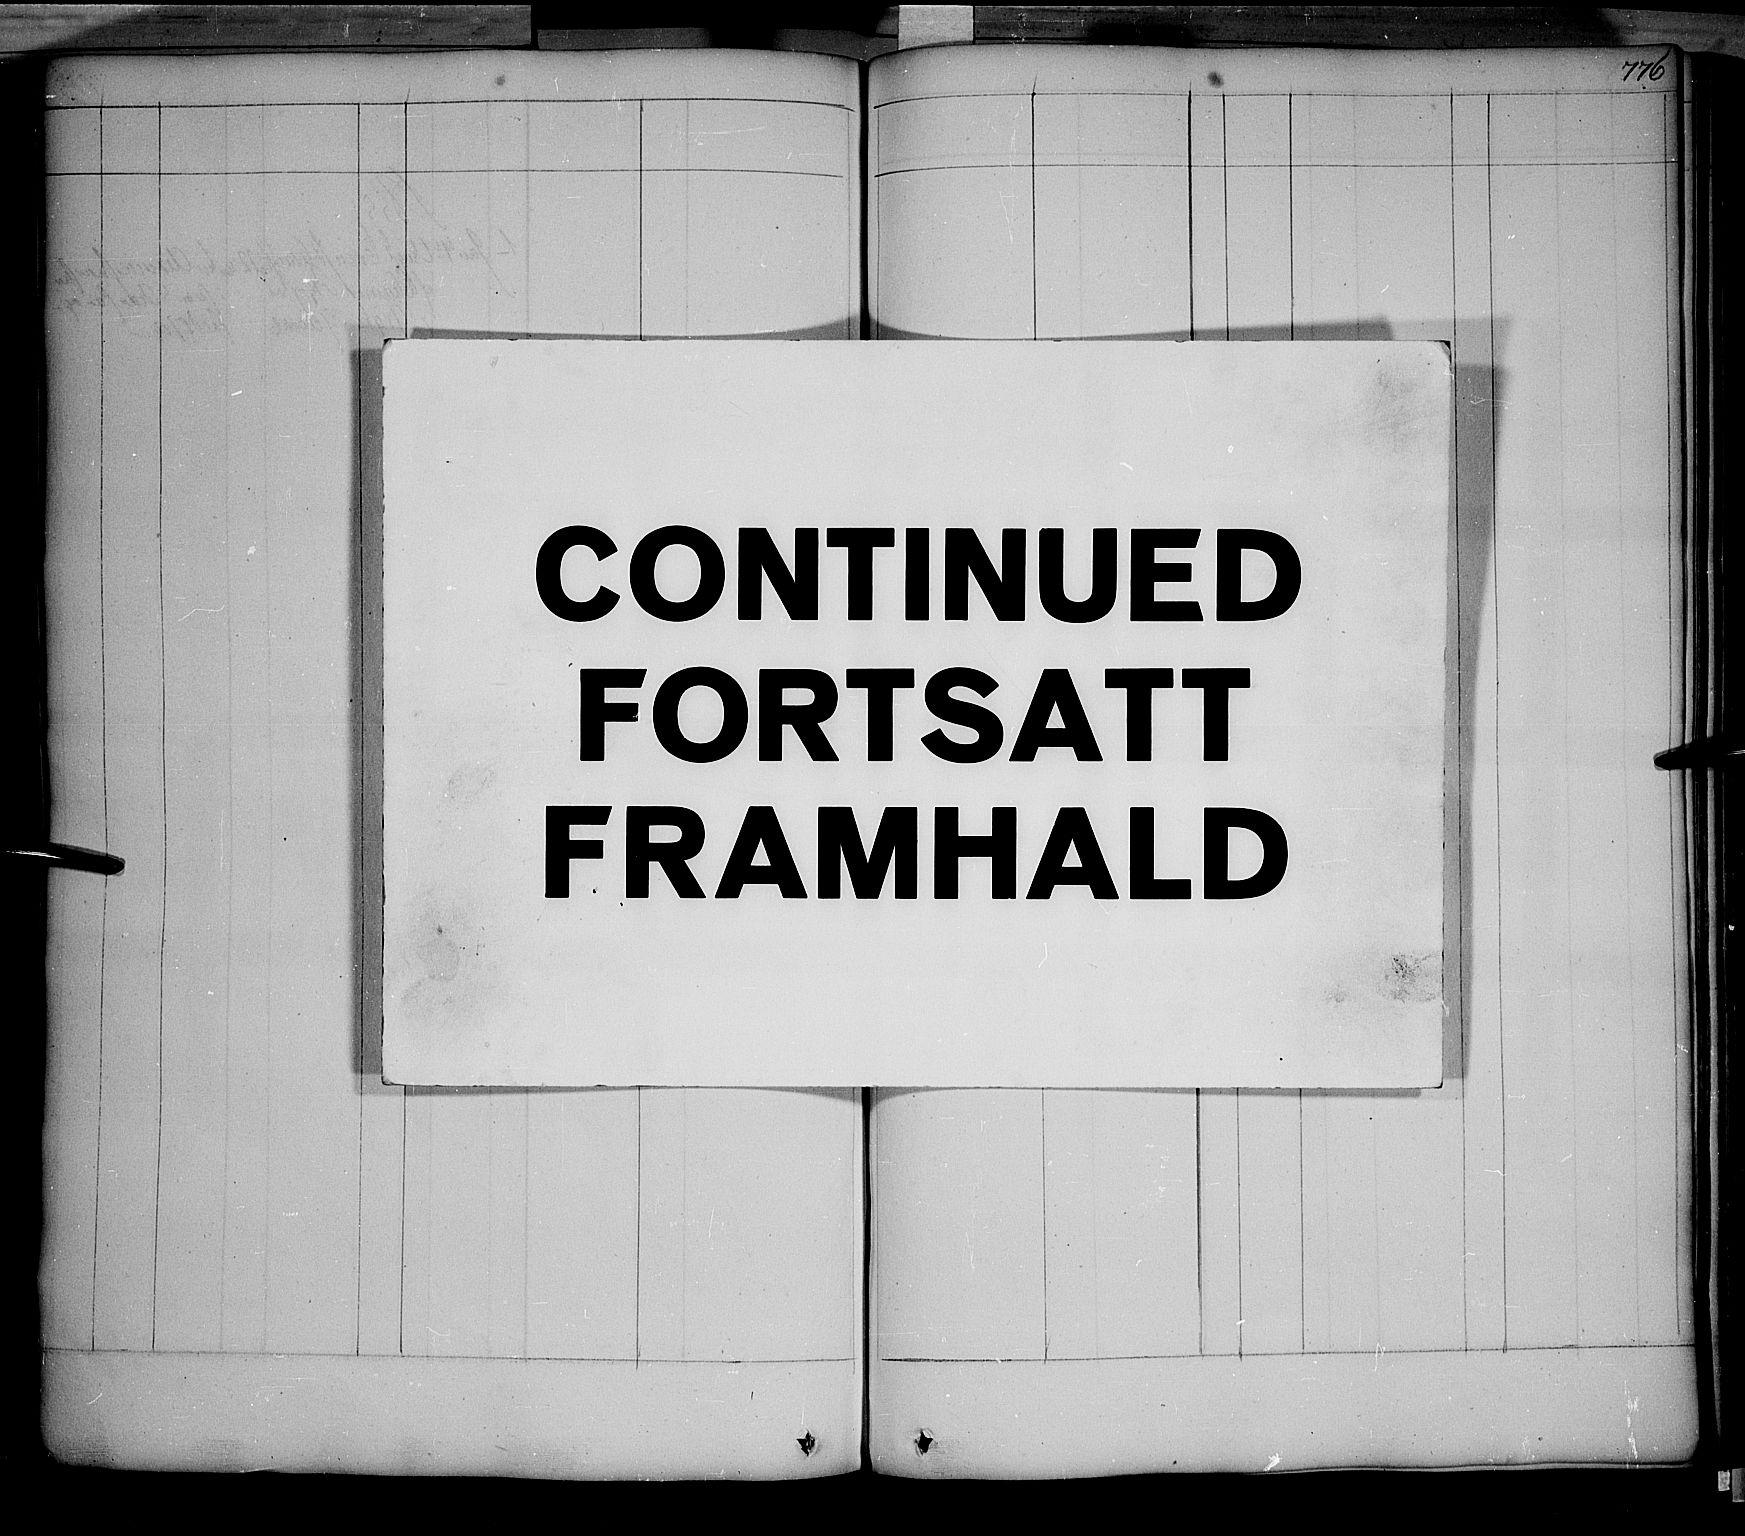 SAH, Fåberg prestekontor, Ministerialbok nr. 5, 1836-1854, s. 775-776